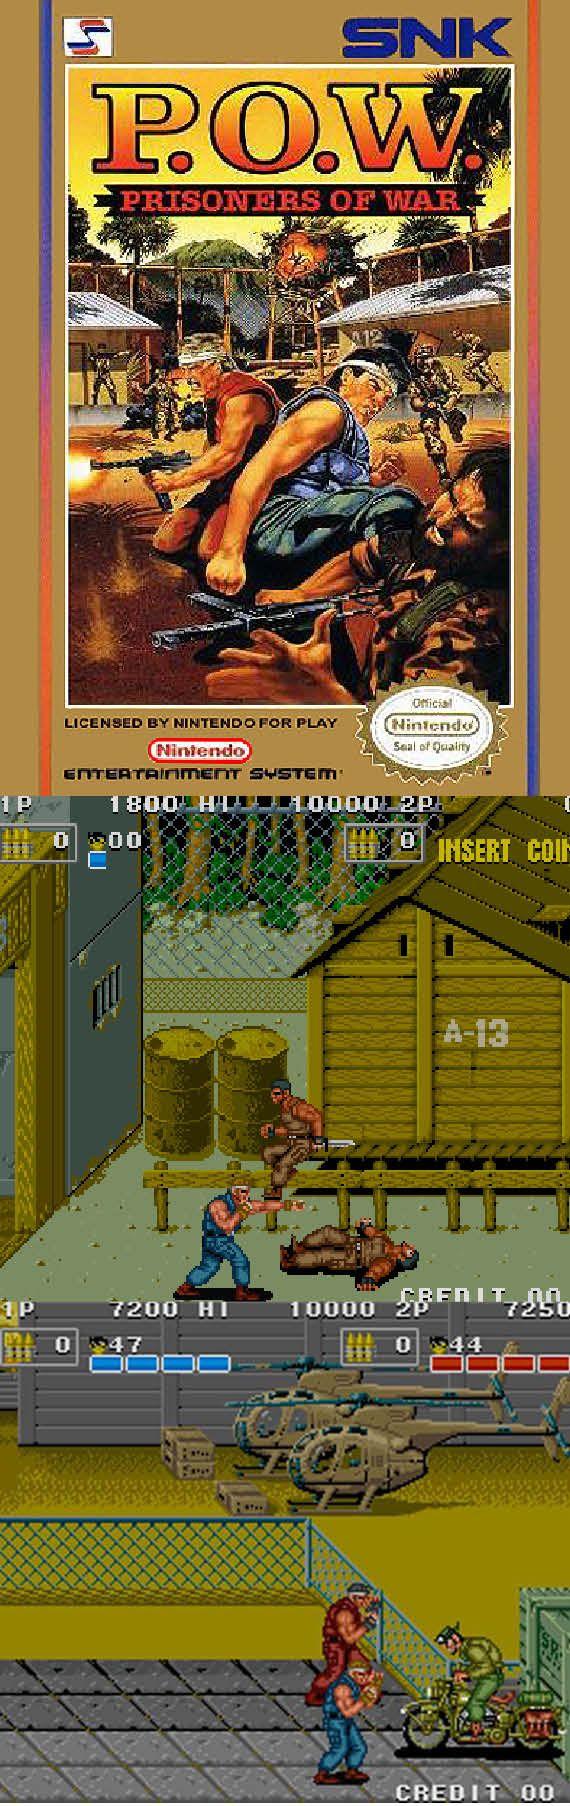 Retro Gamer The 1988 arcade classic Prisoners of War is